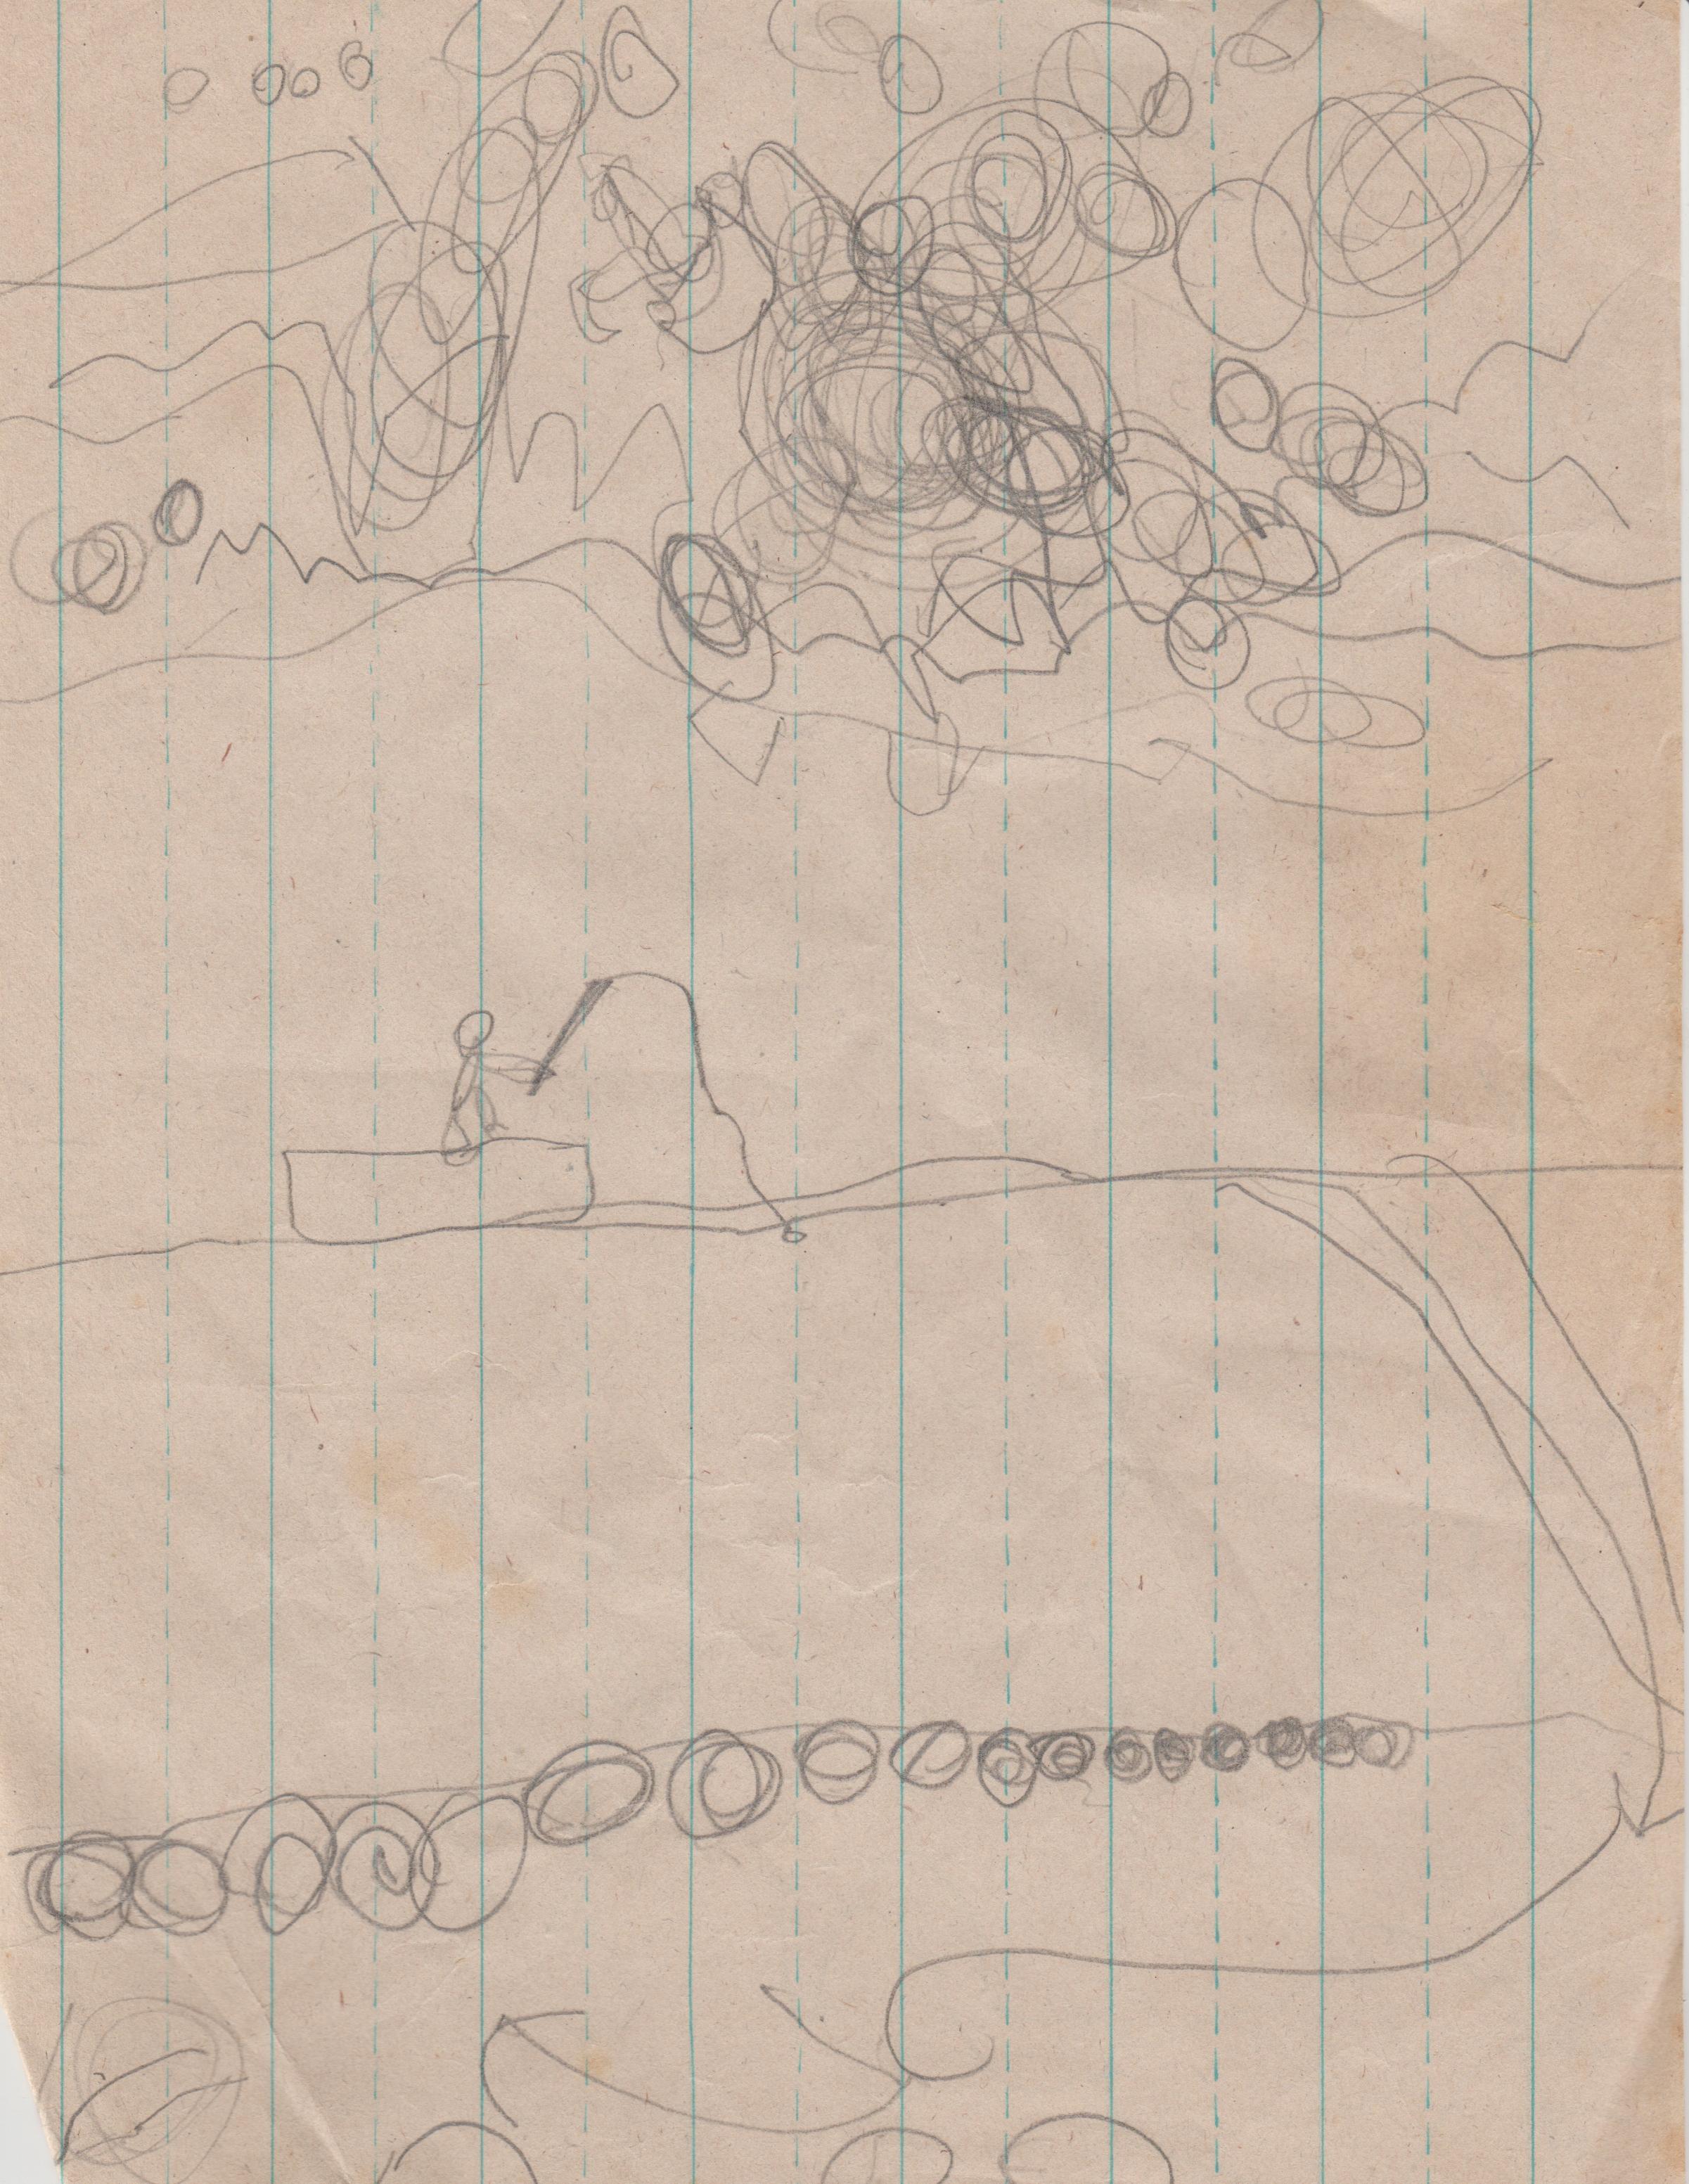 1994 maybe - Art - People, outside, house, running-1.jpg